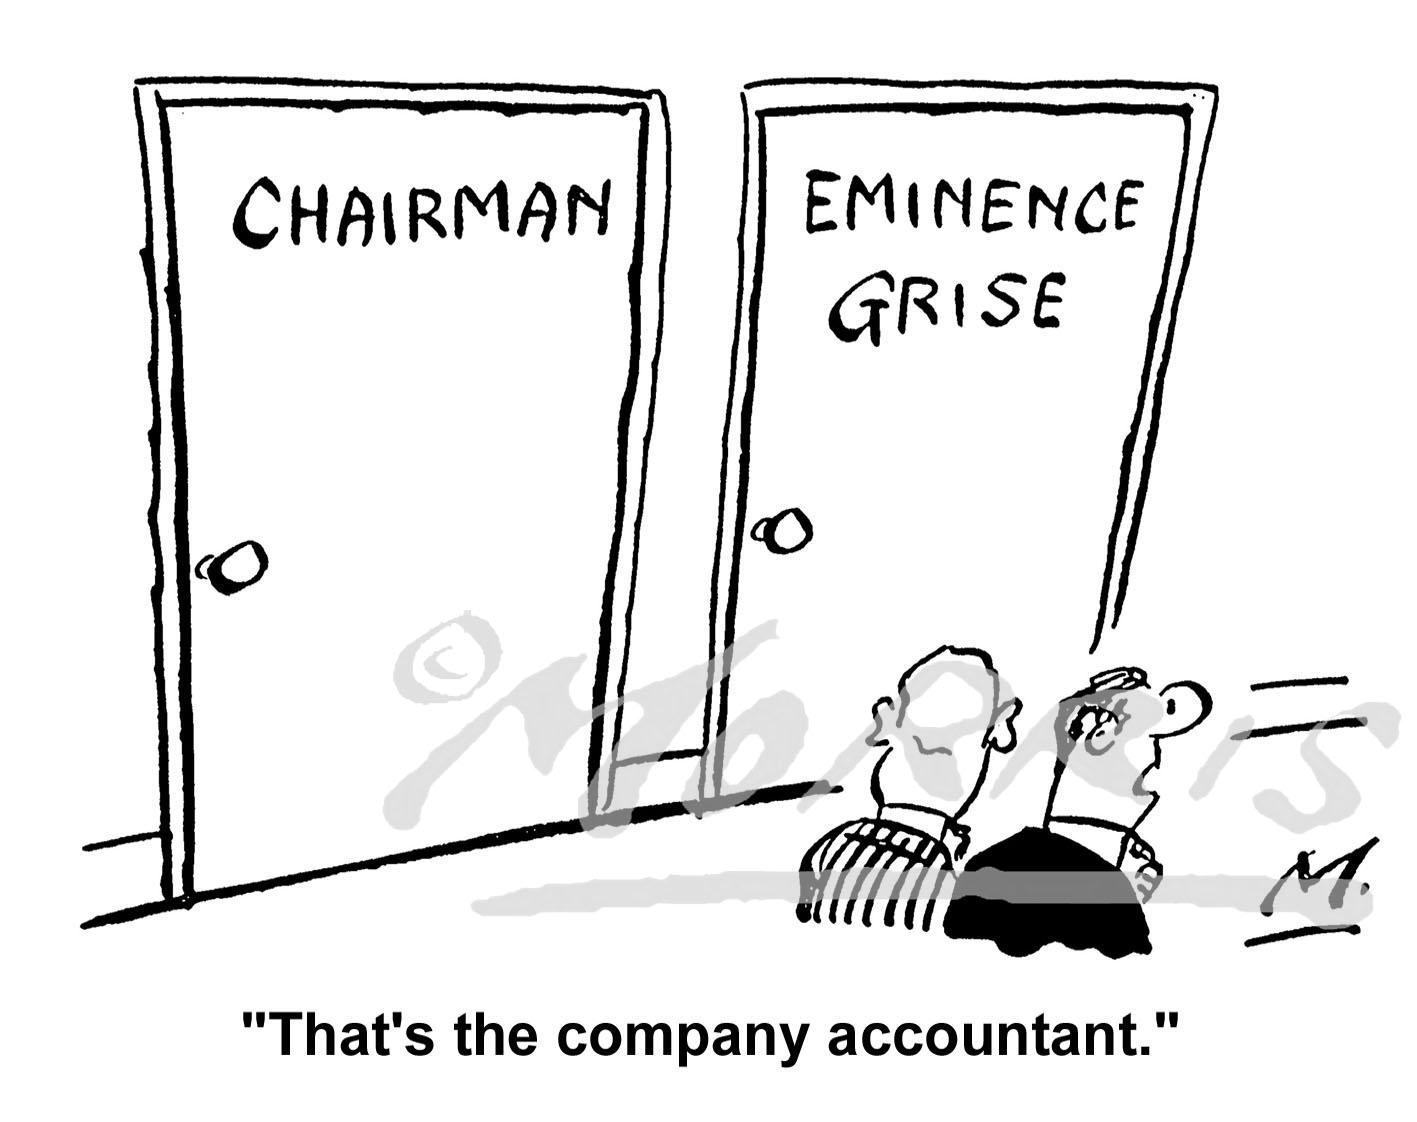 Accountant cartoon – Ref: 0580bw